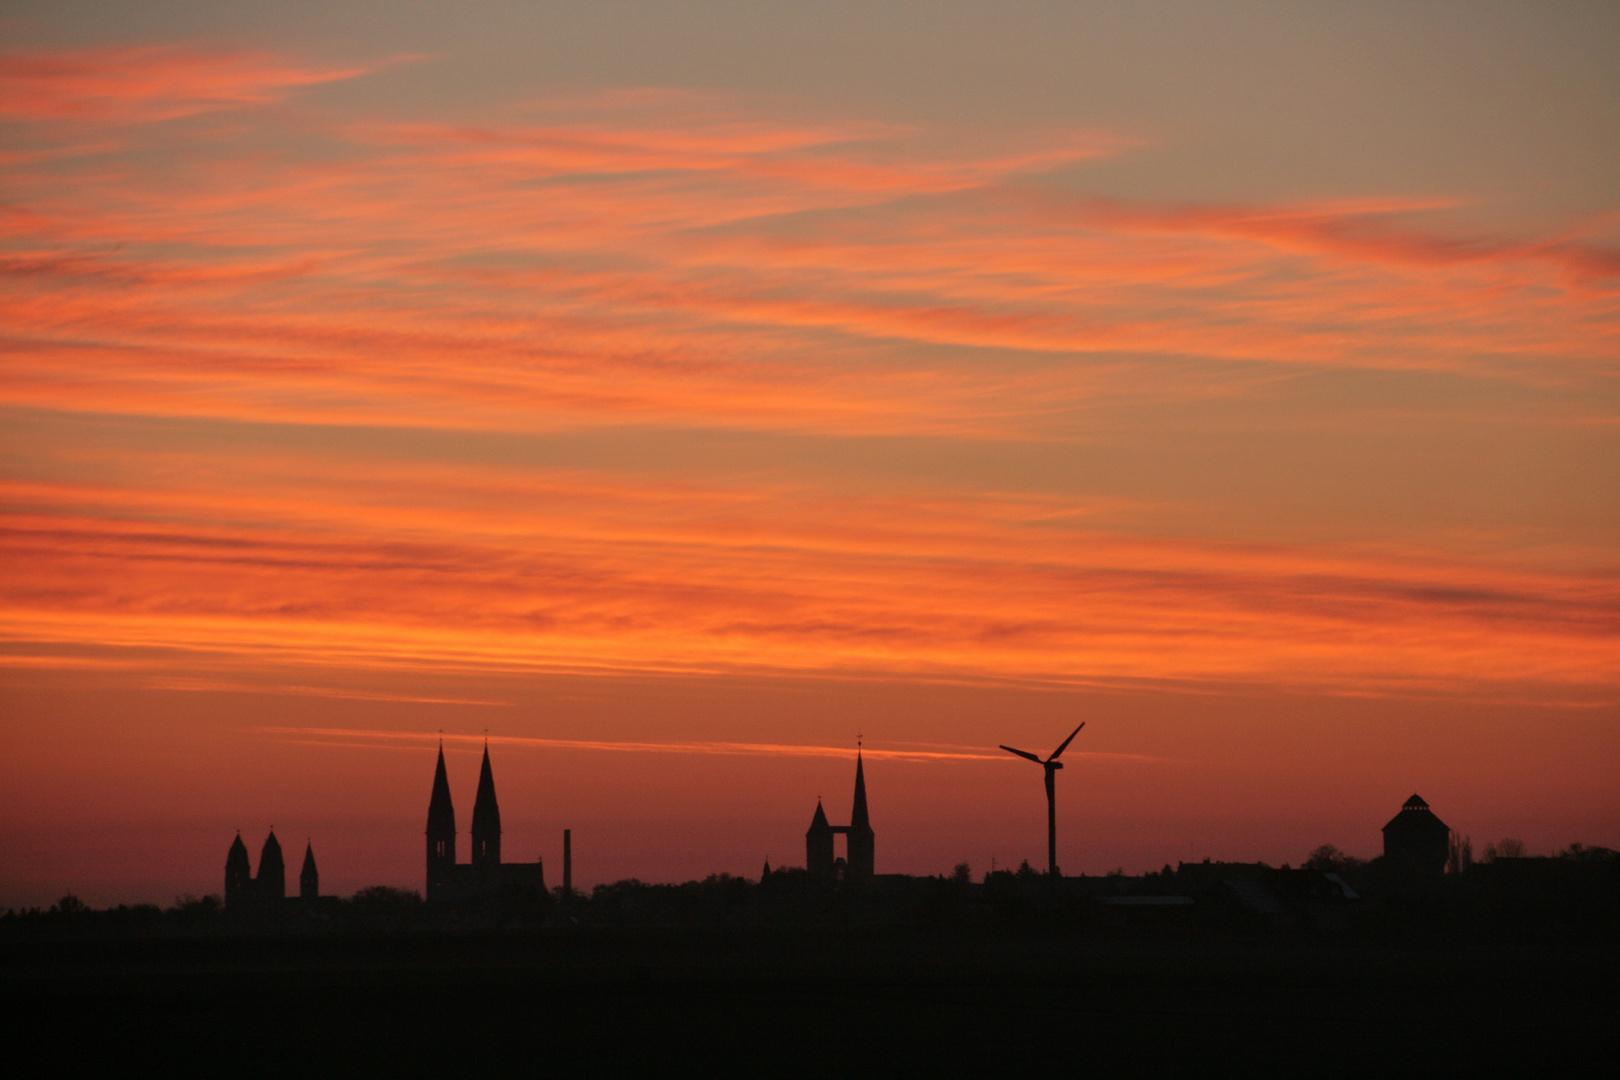 Sonnenaufgang über Halberstadt am Earth Day